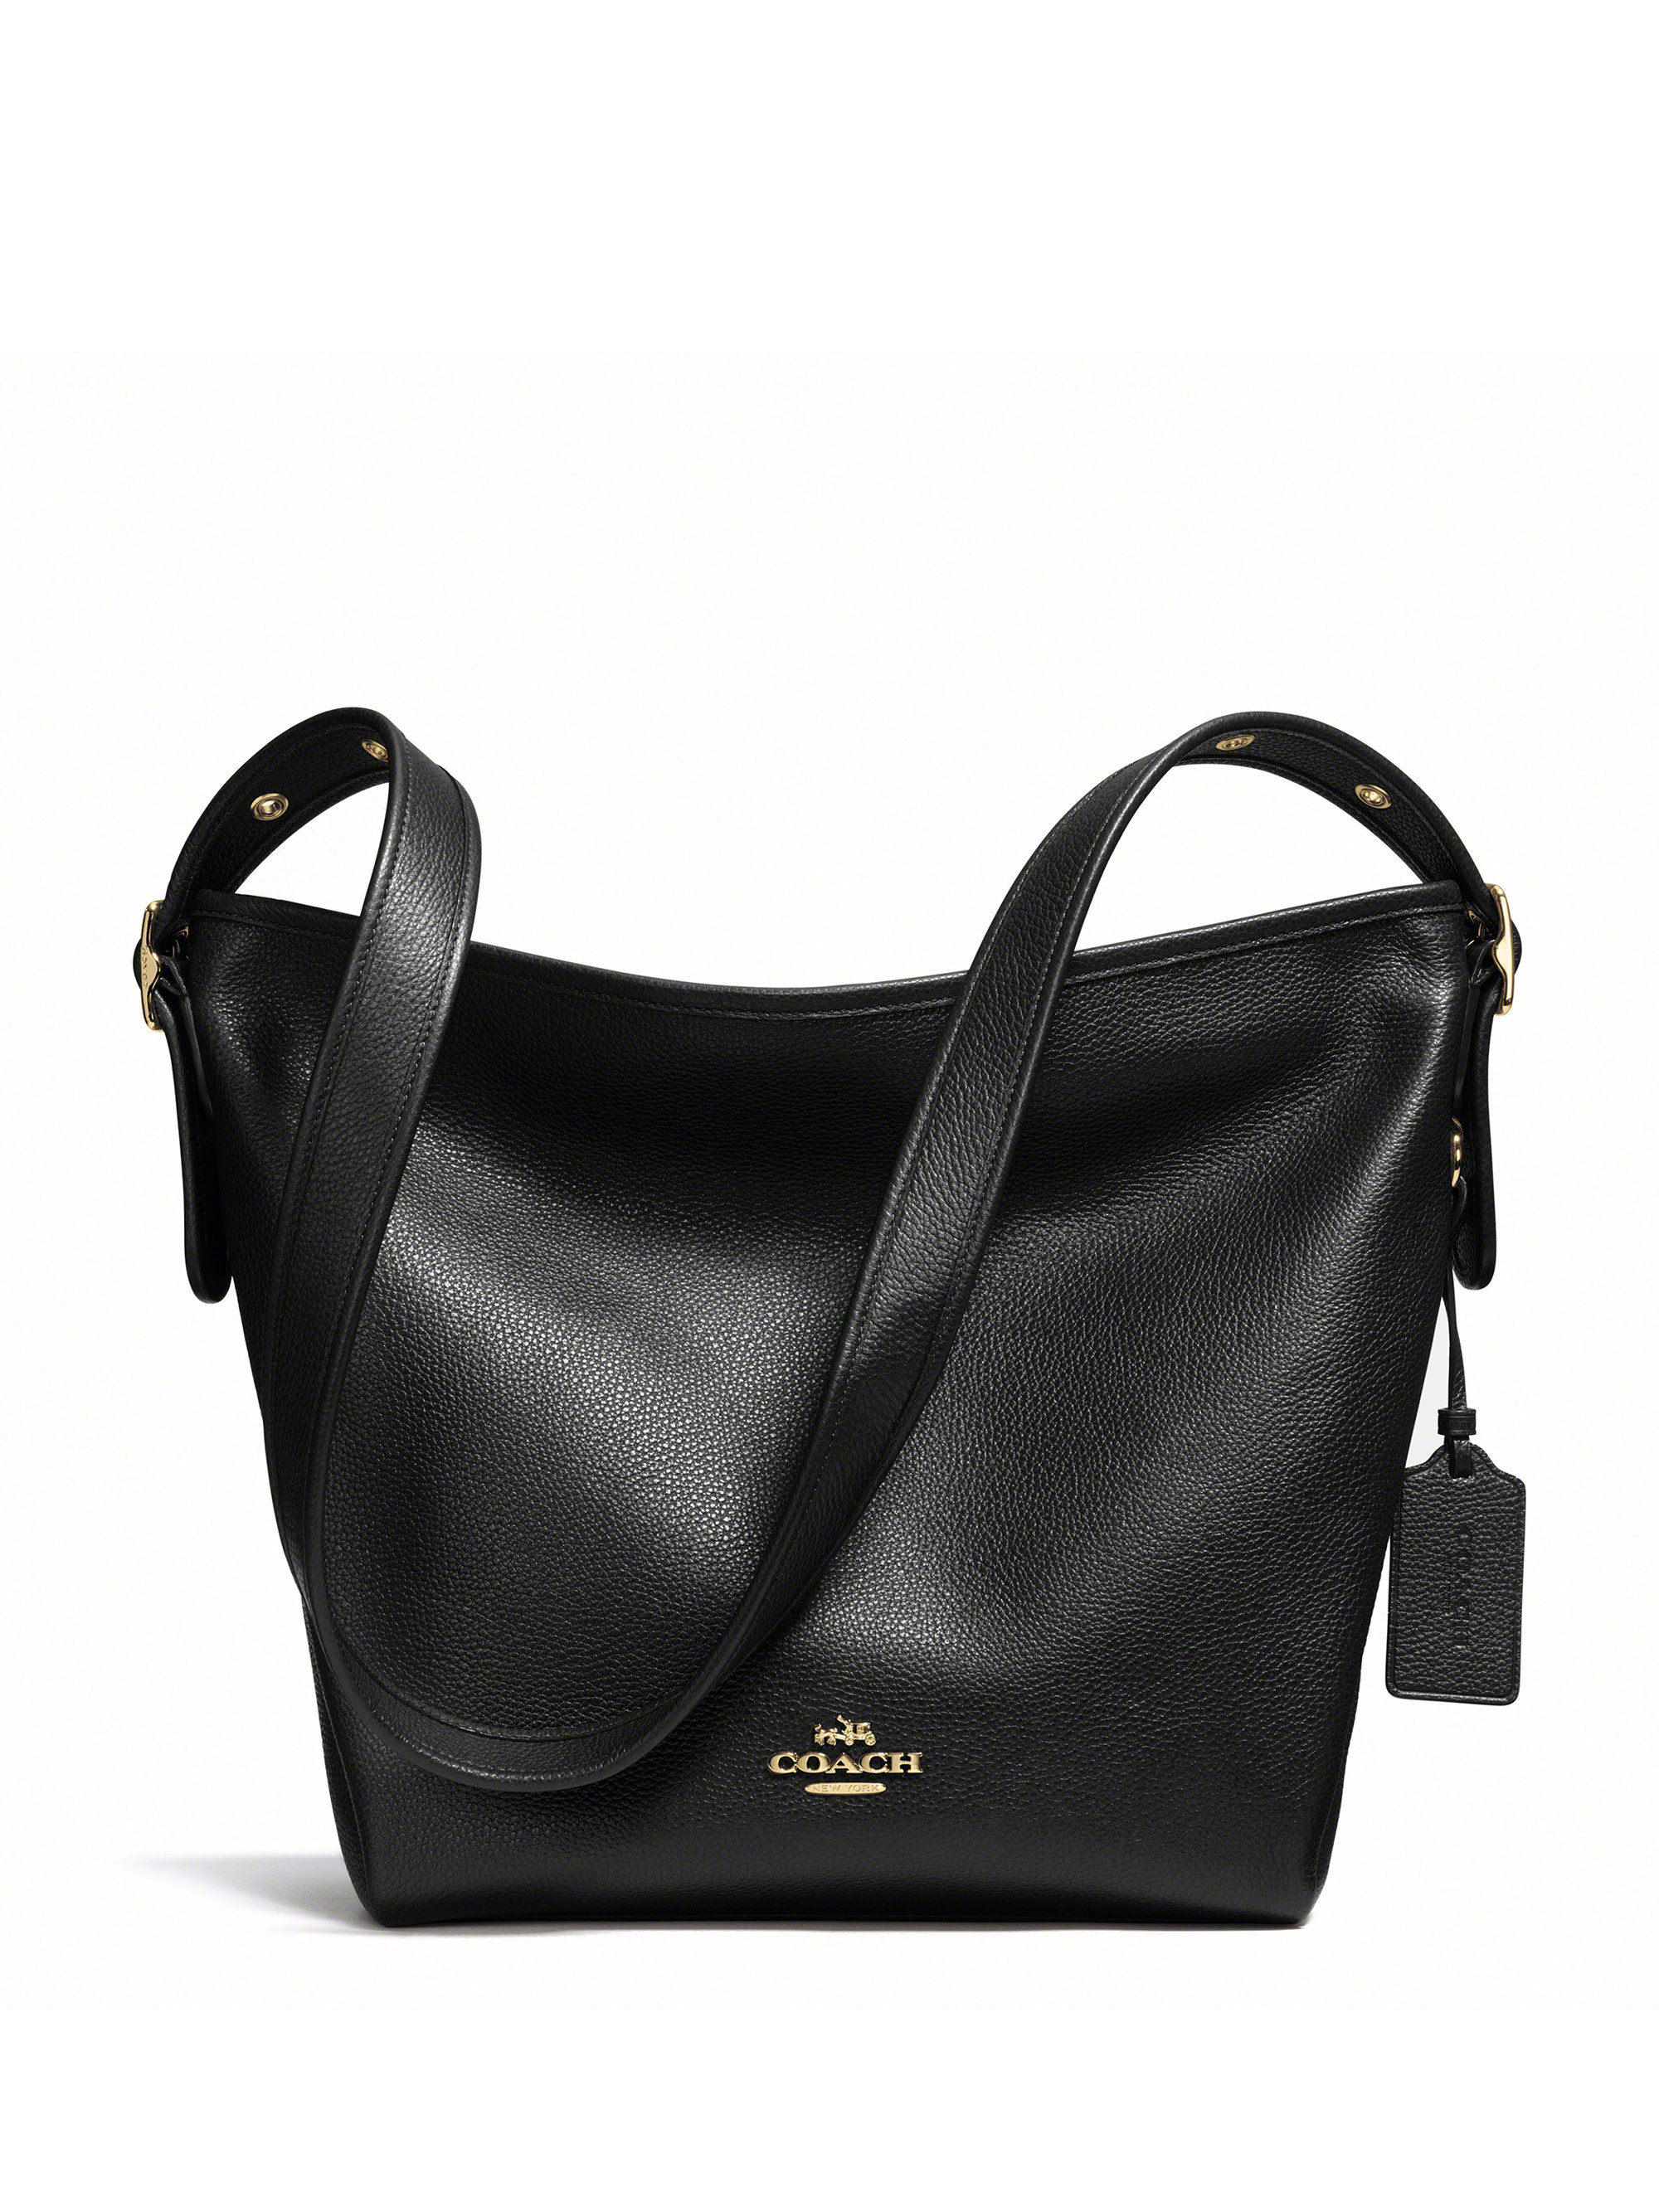 coach dufflette leather shoulder bag in black lyst